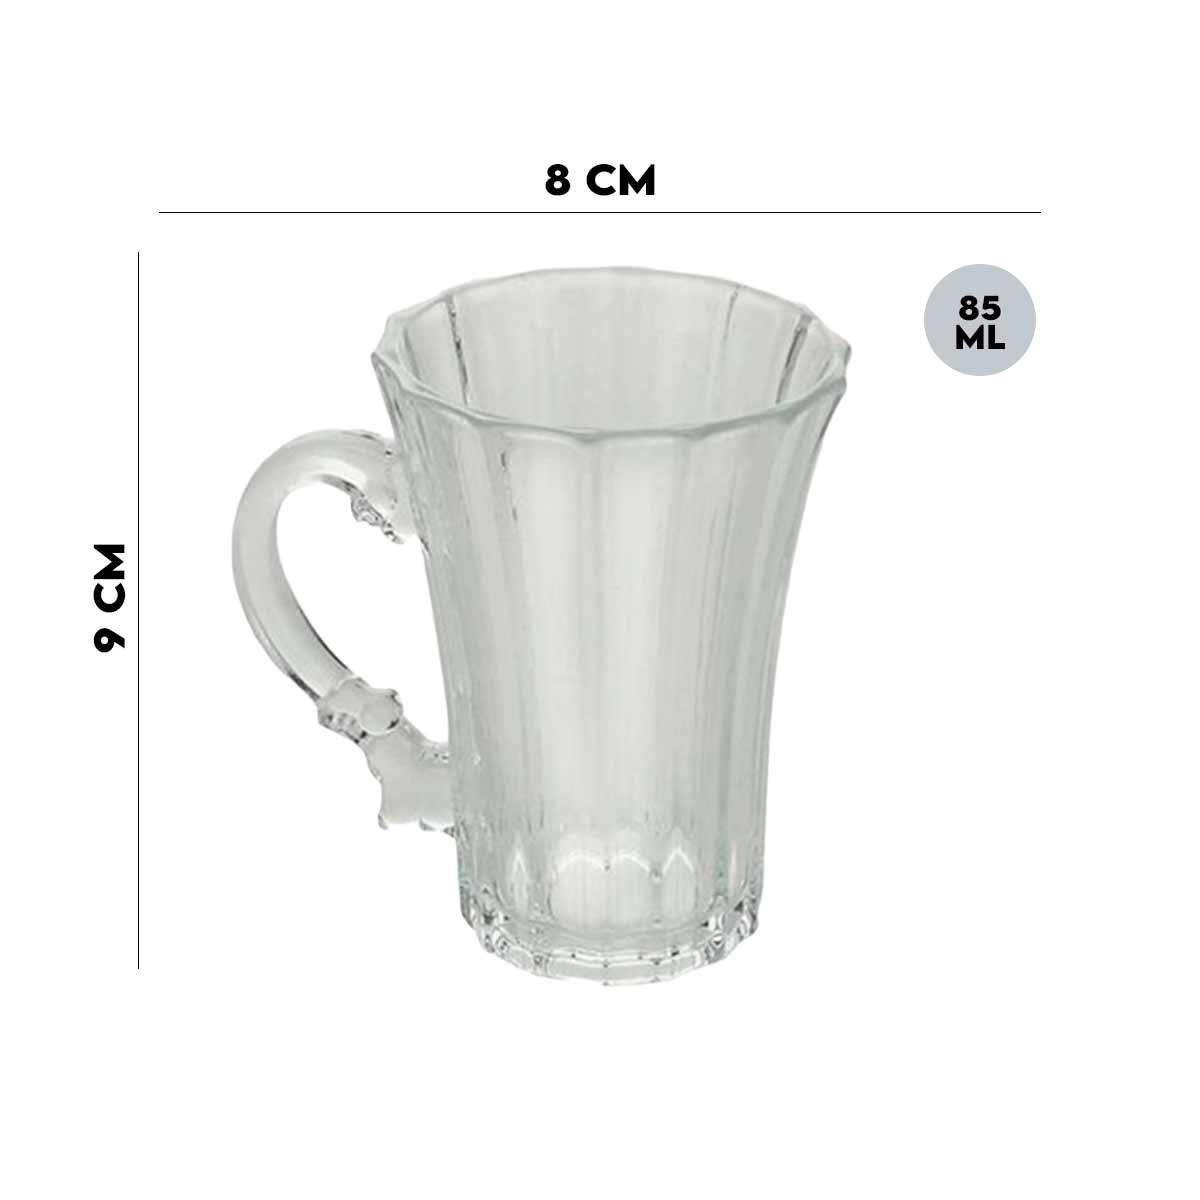 Caneca de Cristal de Chumbo Renaissance 85ml Lyor  - Lemis